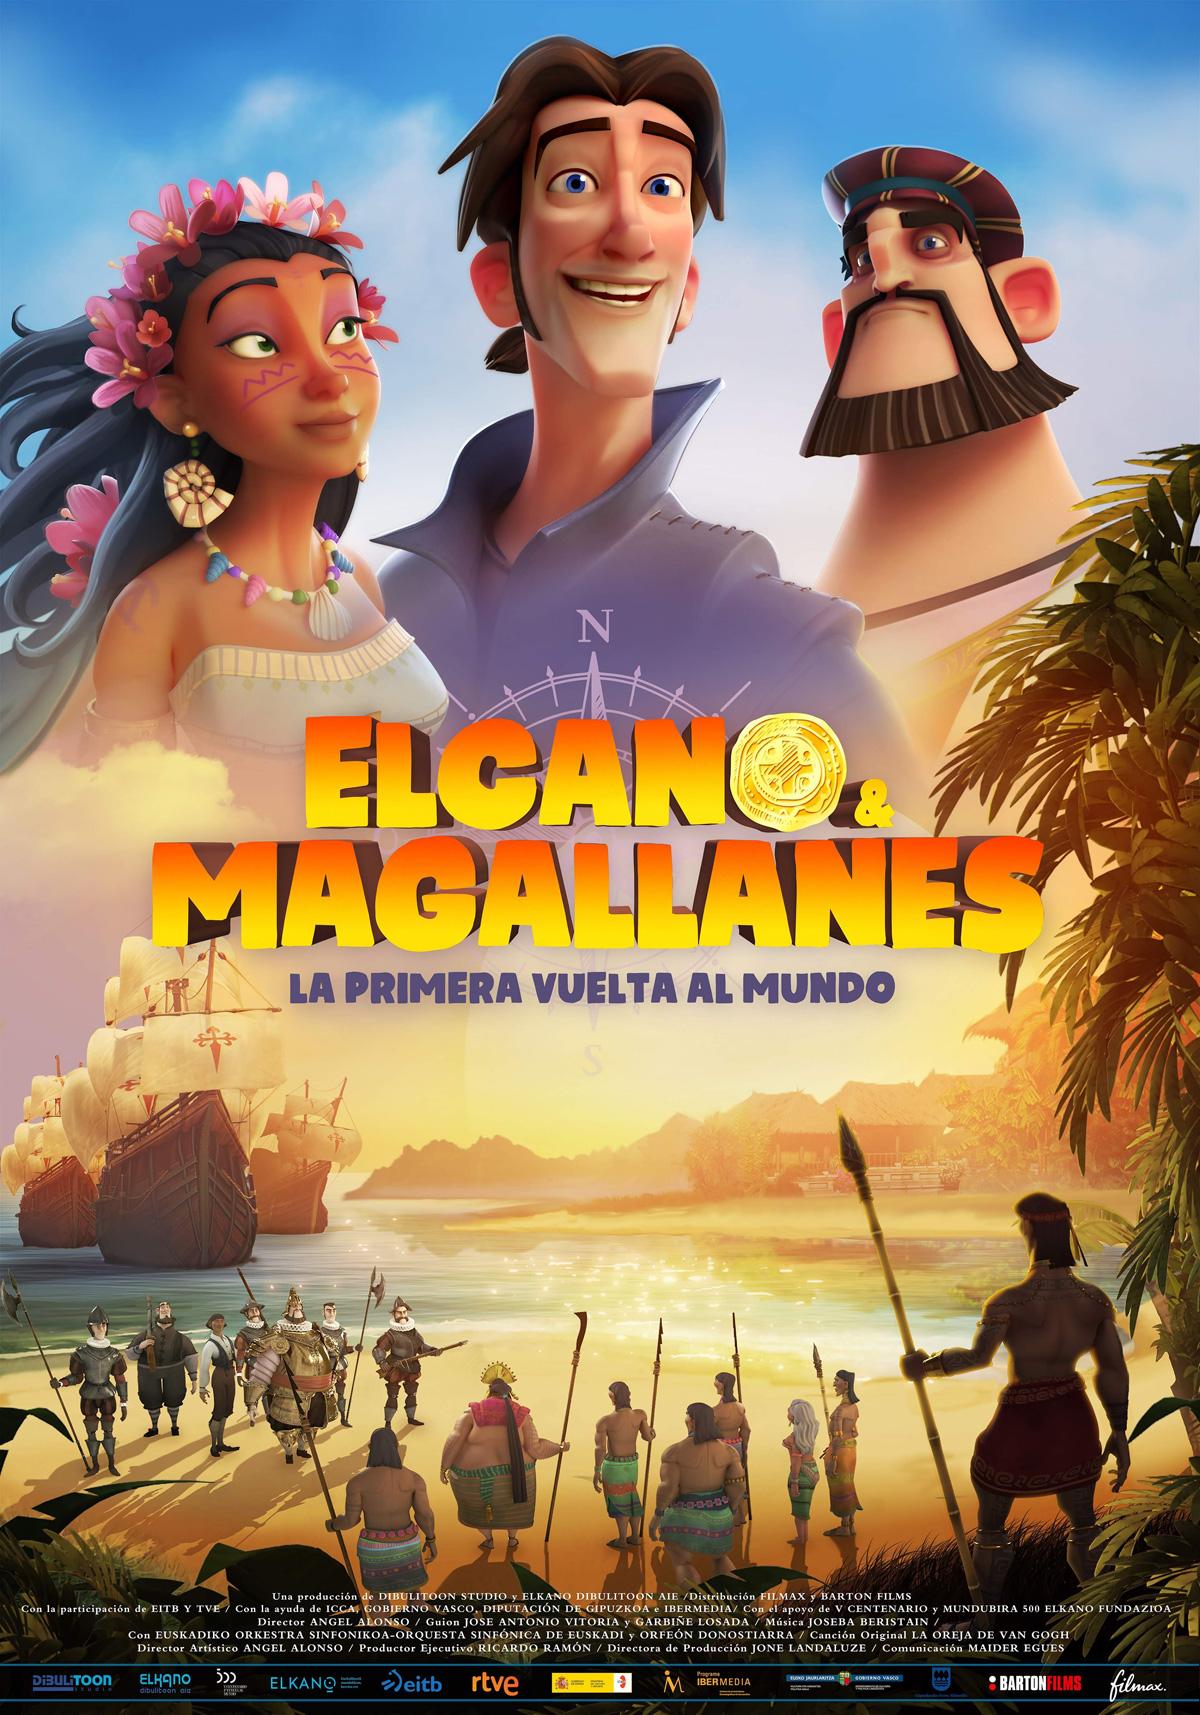 [好雷] 環遊世界大冒險 Elcano y Magallanes (2019 西班牙動畫長片)